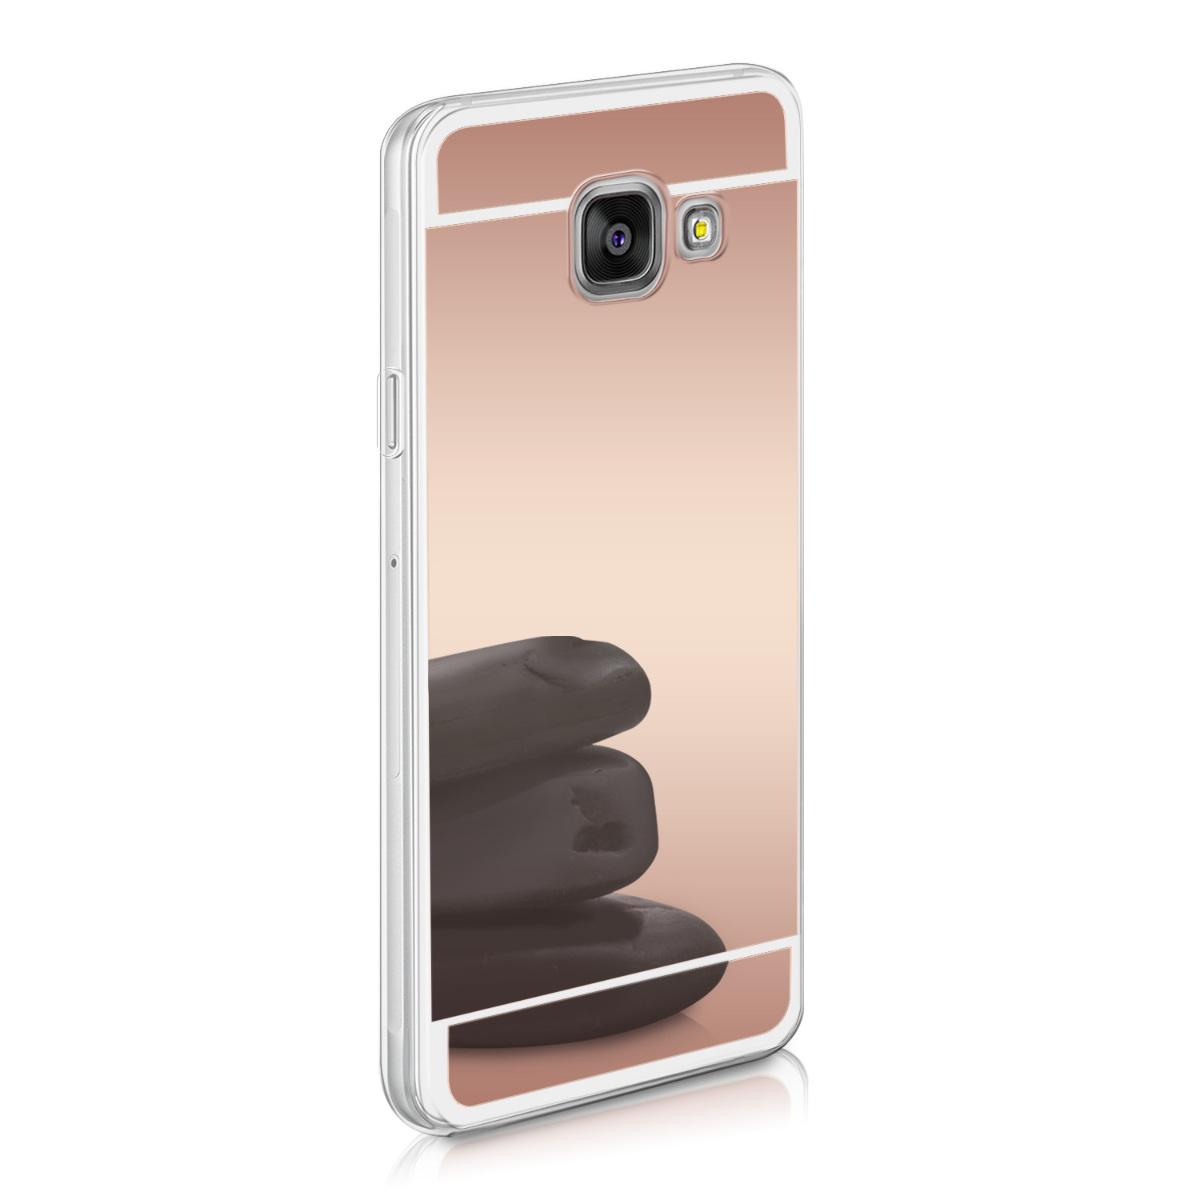 KW Θήκη Σιλικόνης (TPU) με Καθρέφτη Samsung Galaxy A3 (2016) - Rose Gold Reflective (37788.54)